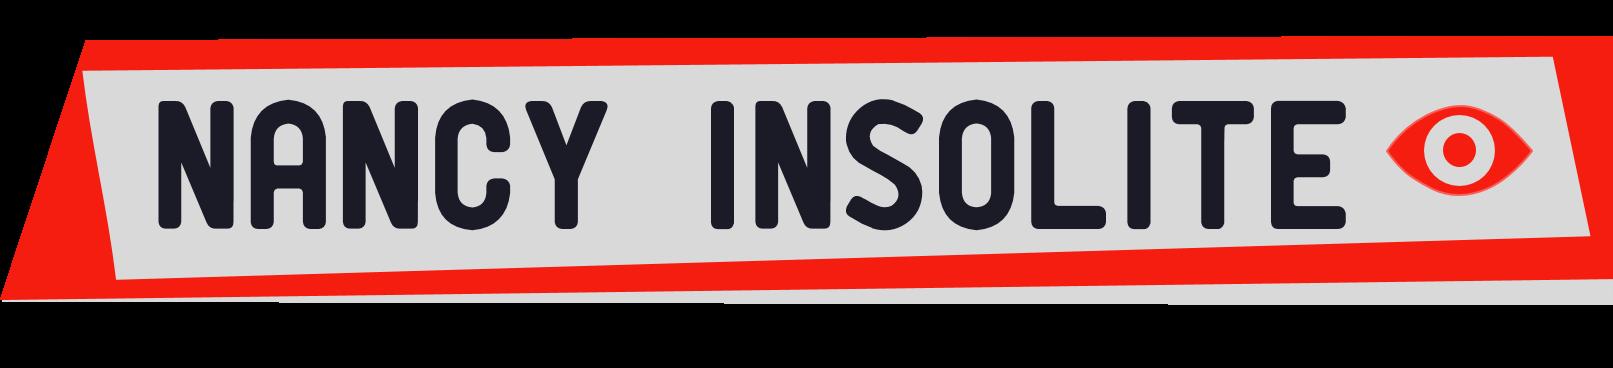 Nancy Insolite